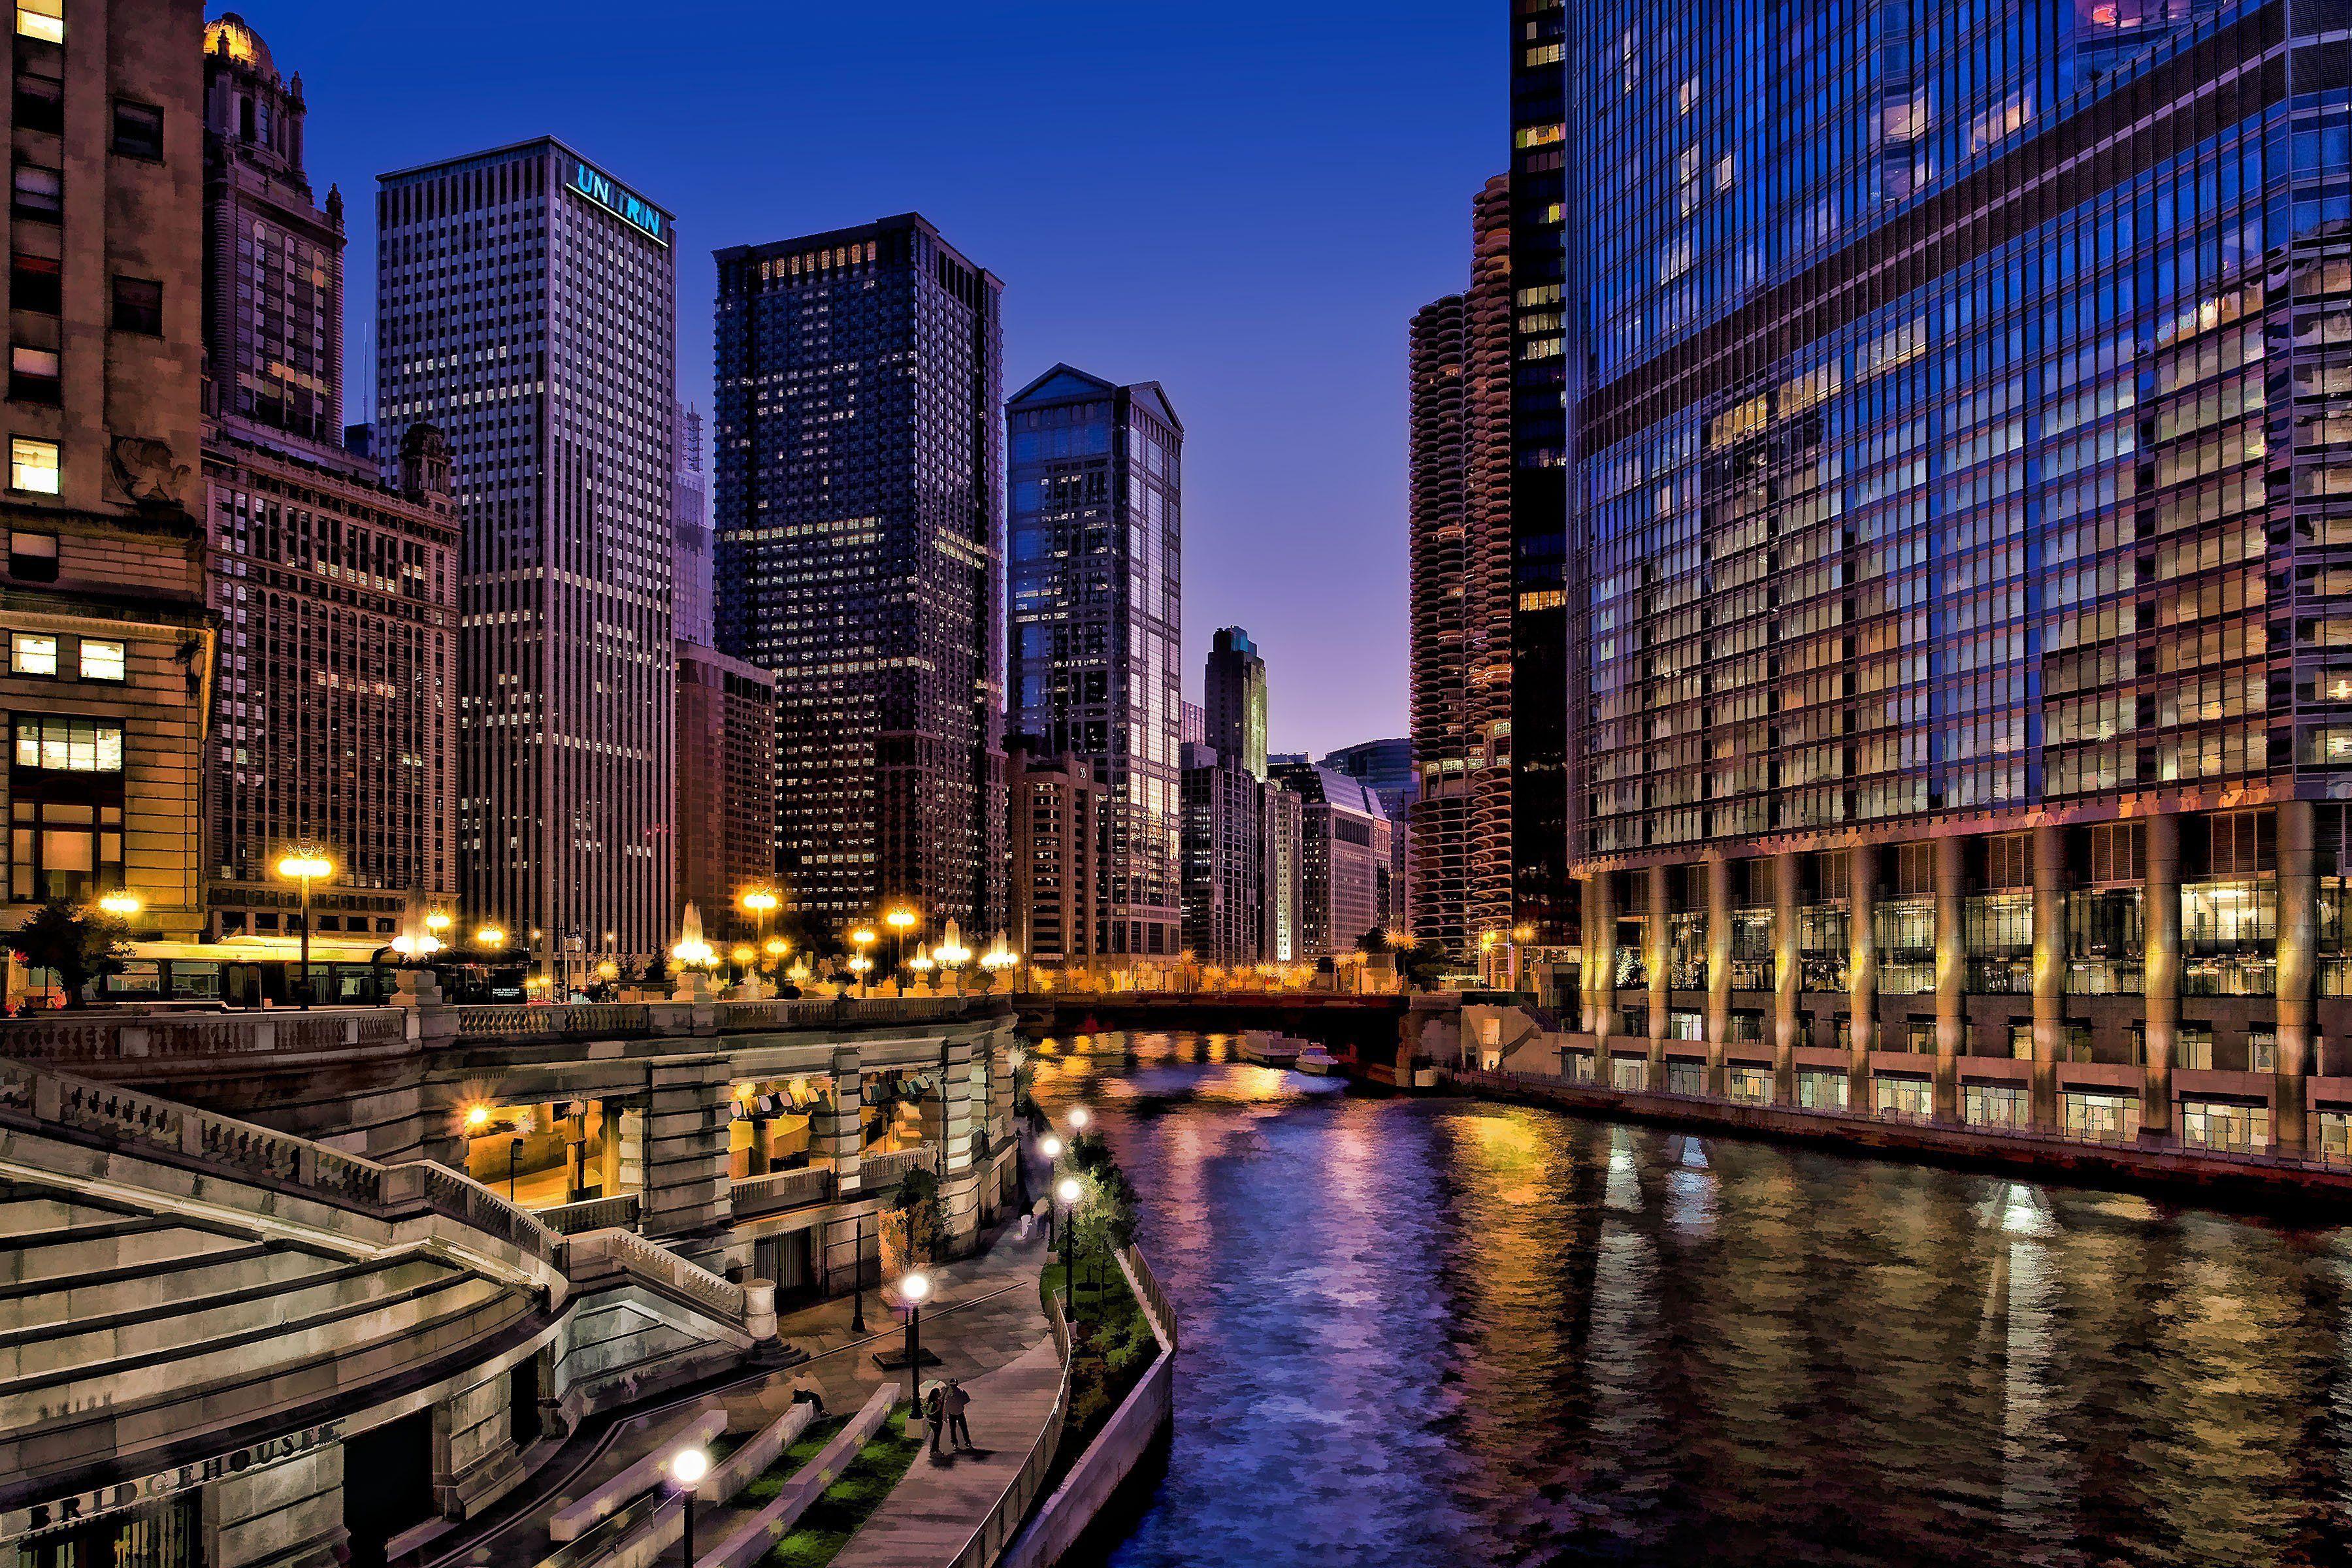 Beautiful Wallpaper Night Chicago - 75c31f10c967b718a5f3d15bdd8c2ddc  Best Photo Reference.jpg